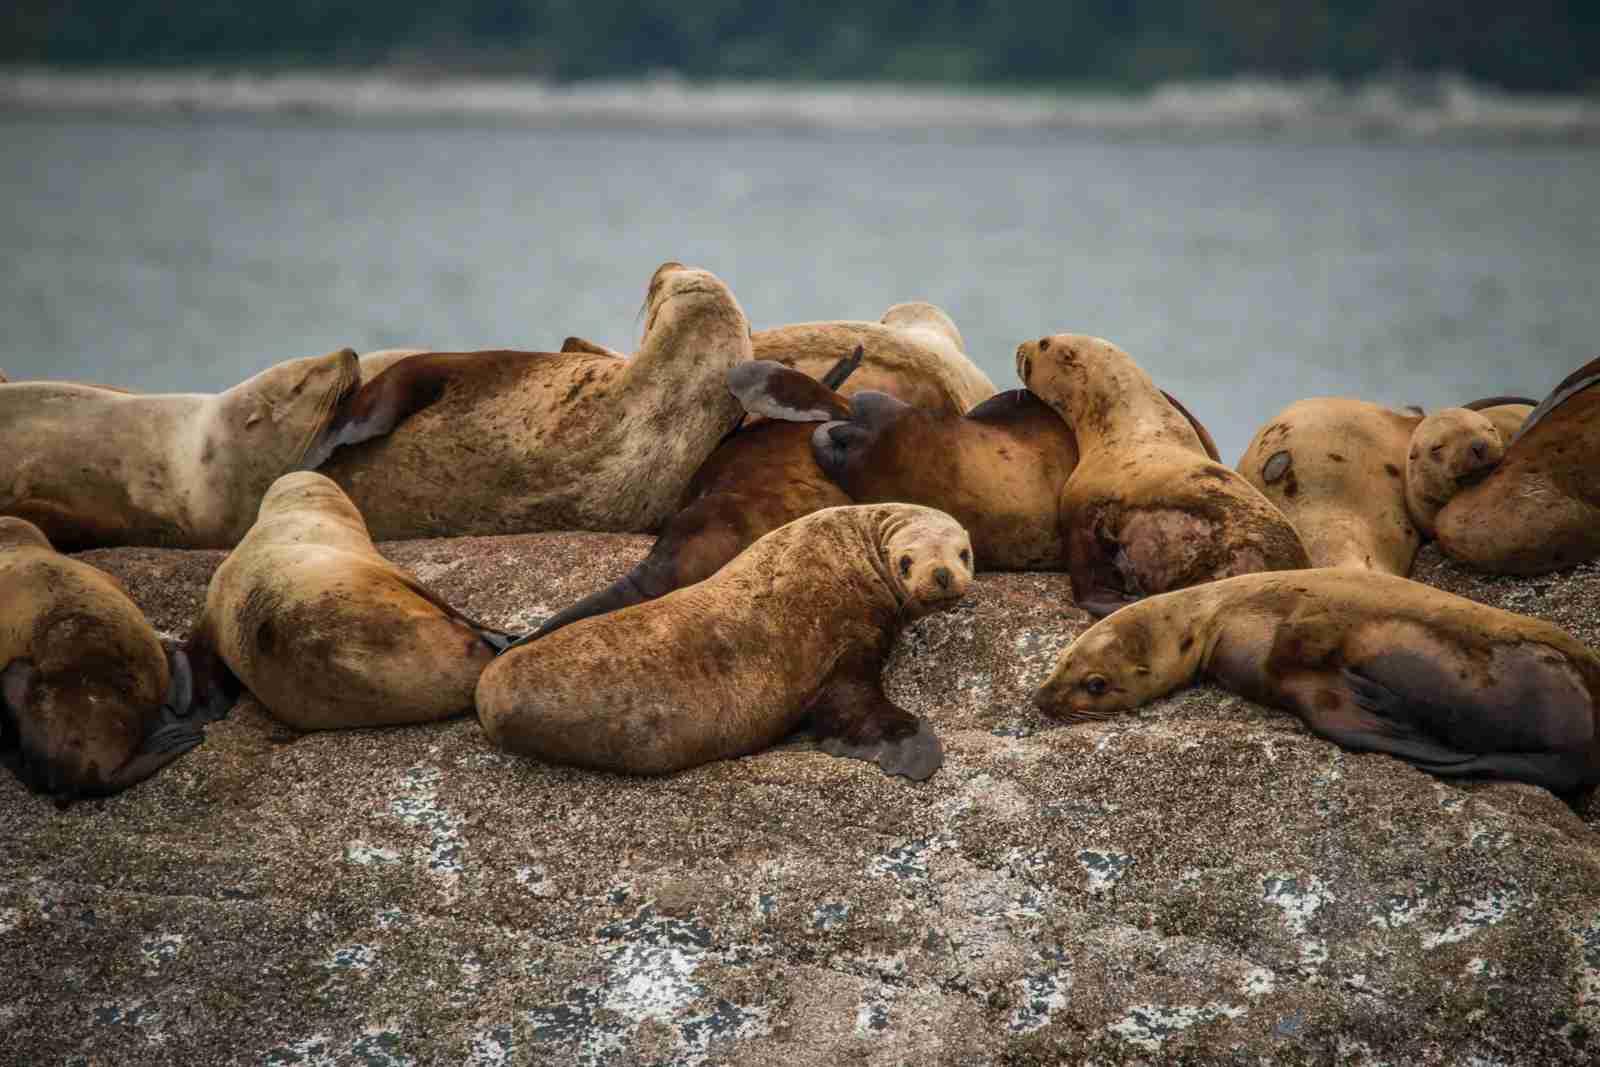 Seals piling up in Juneau, Alaska. (Photo by Steve Halama/Unsplash)